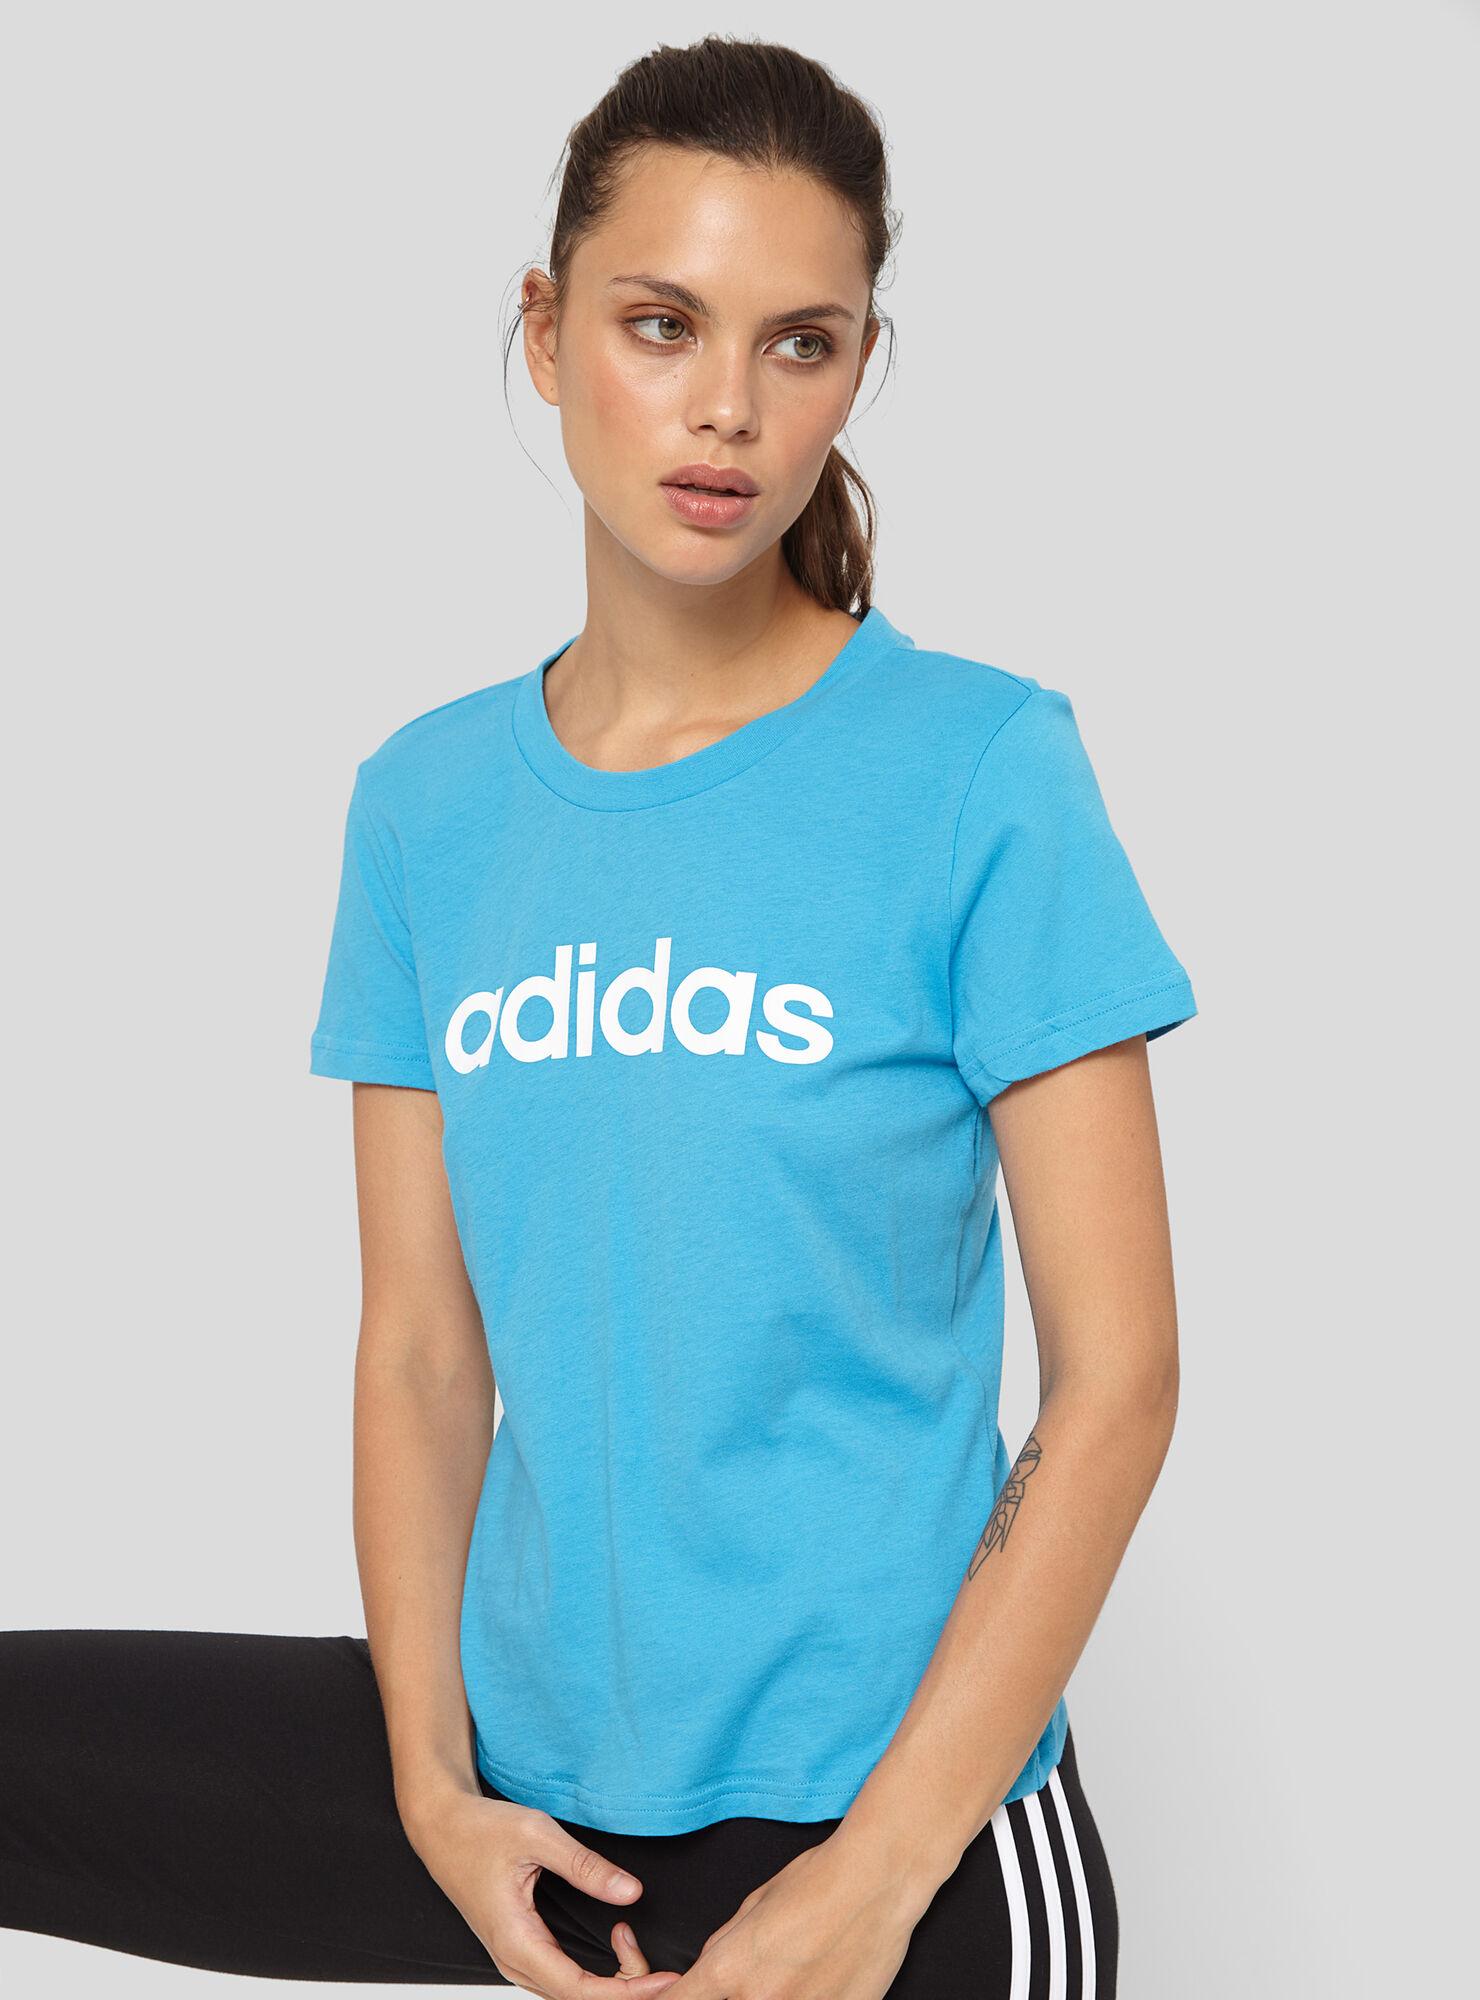 78c1c49763006 Polera Adidas Essentials Linear Mujer - Adidas